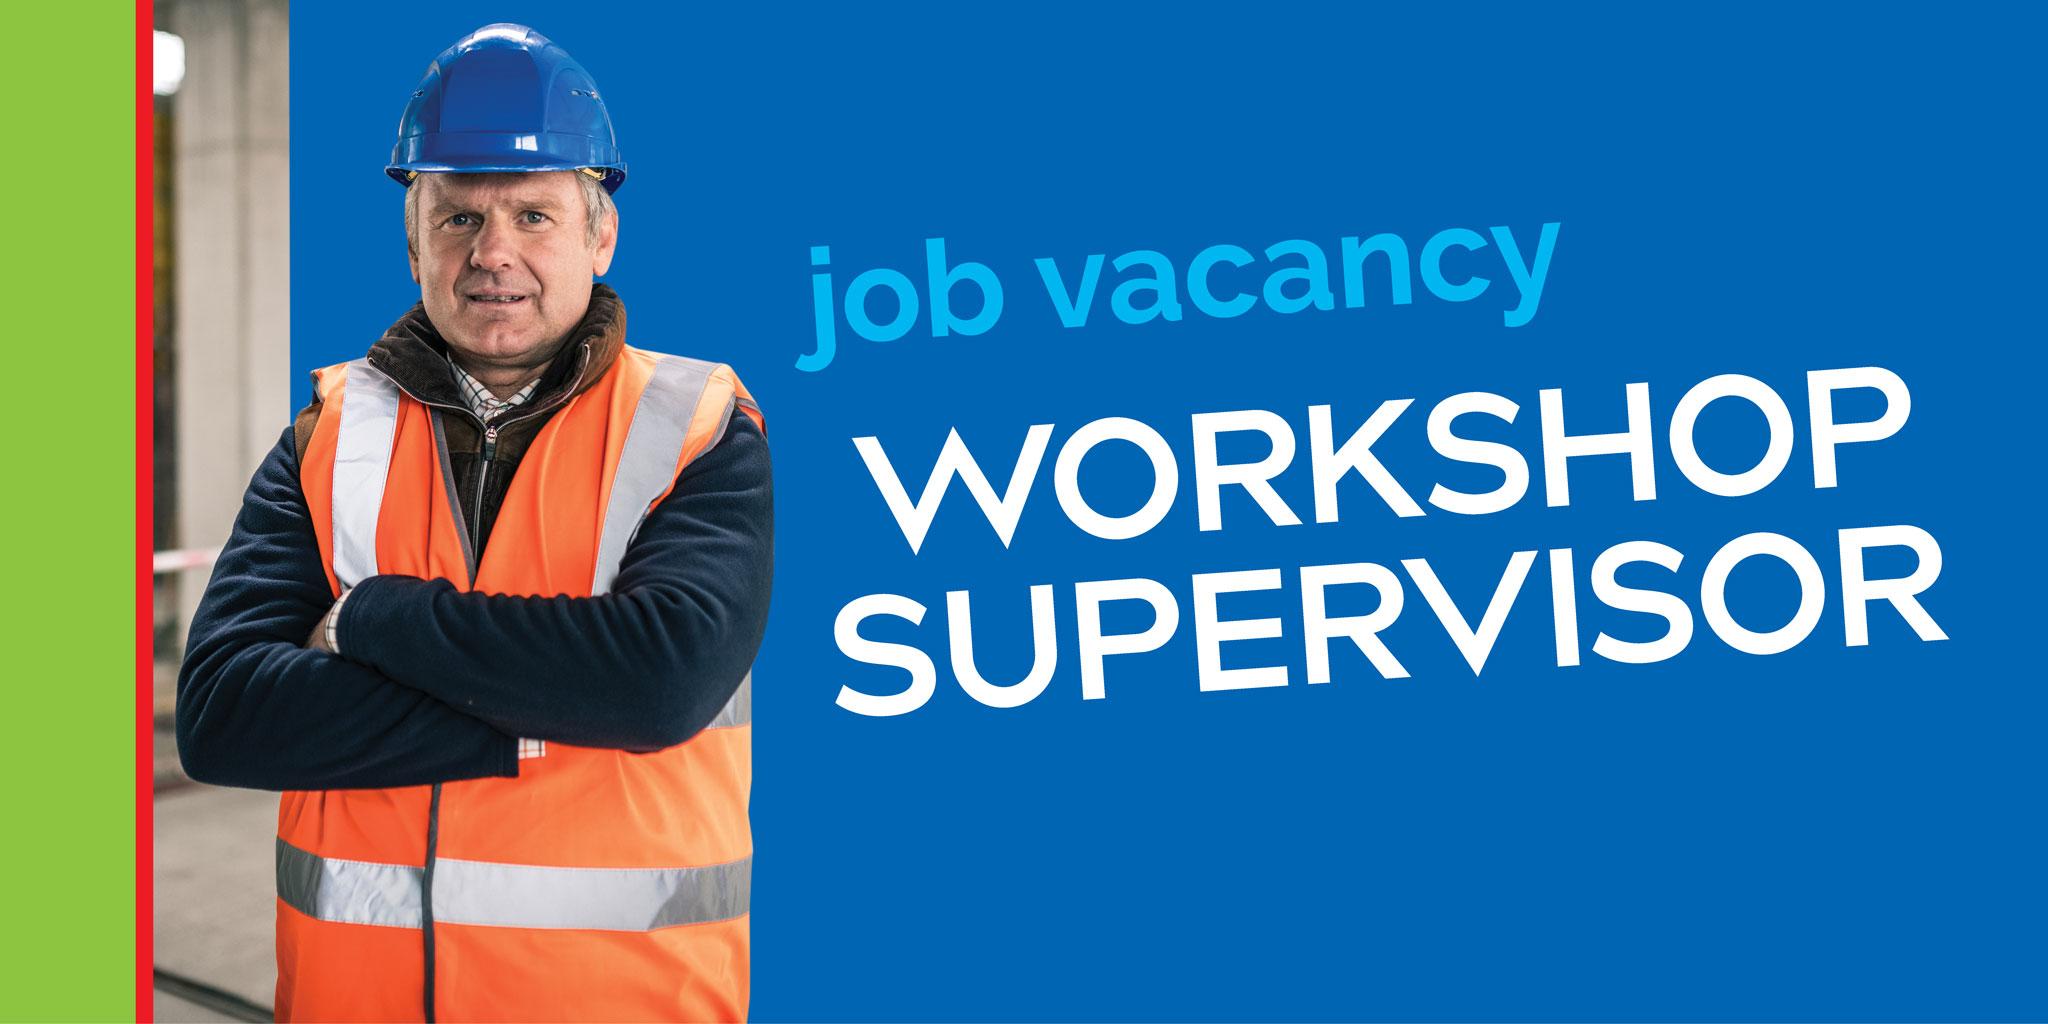 Swindon Bus engineering workshop supervisor